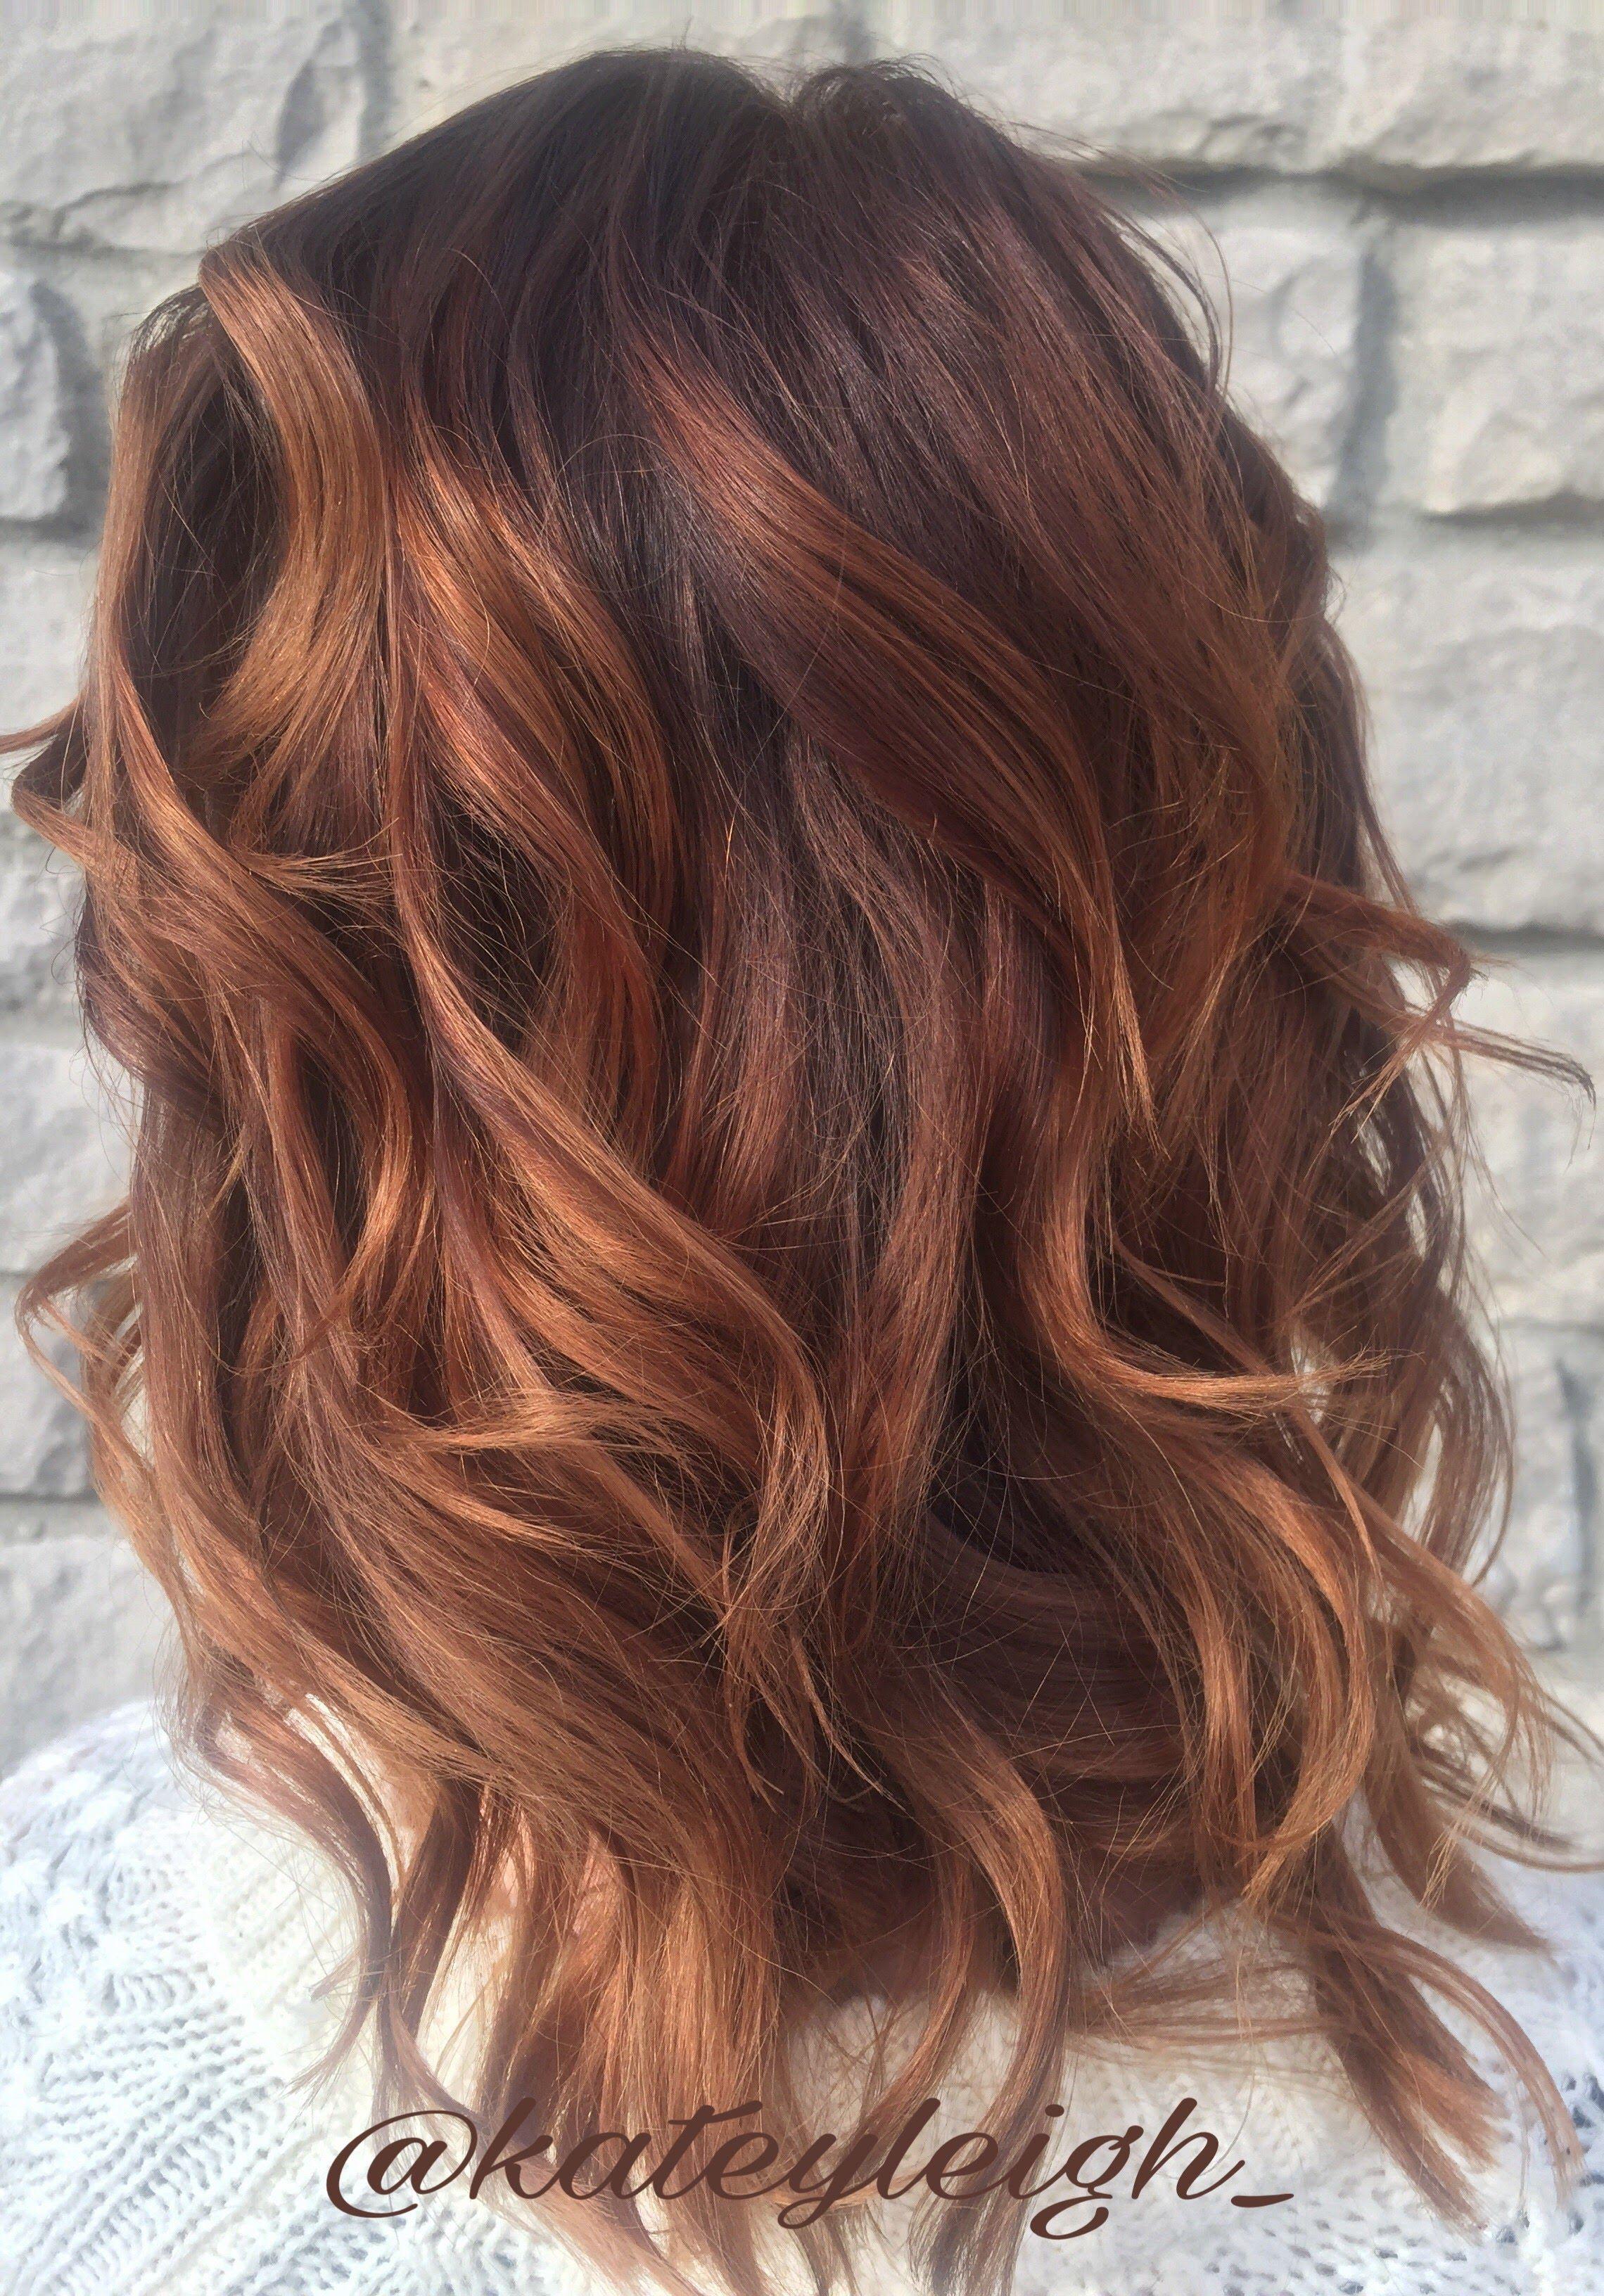 Rose Gold Balayage On A Base Of Red Hair Using Pravana Chromasilk Hair Color And Pravana Express Tones Short Hair Balayage Auburn Balayage Balayage